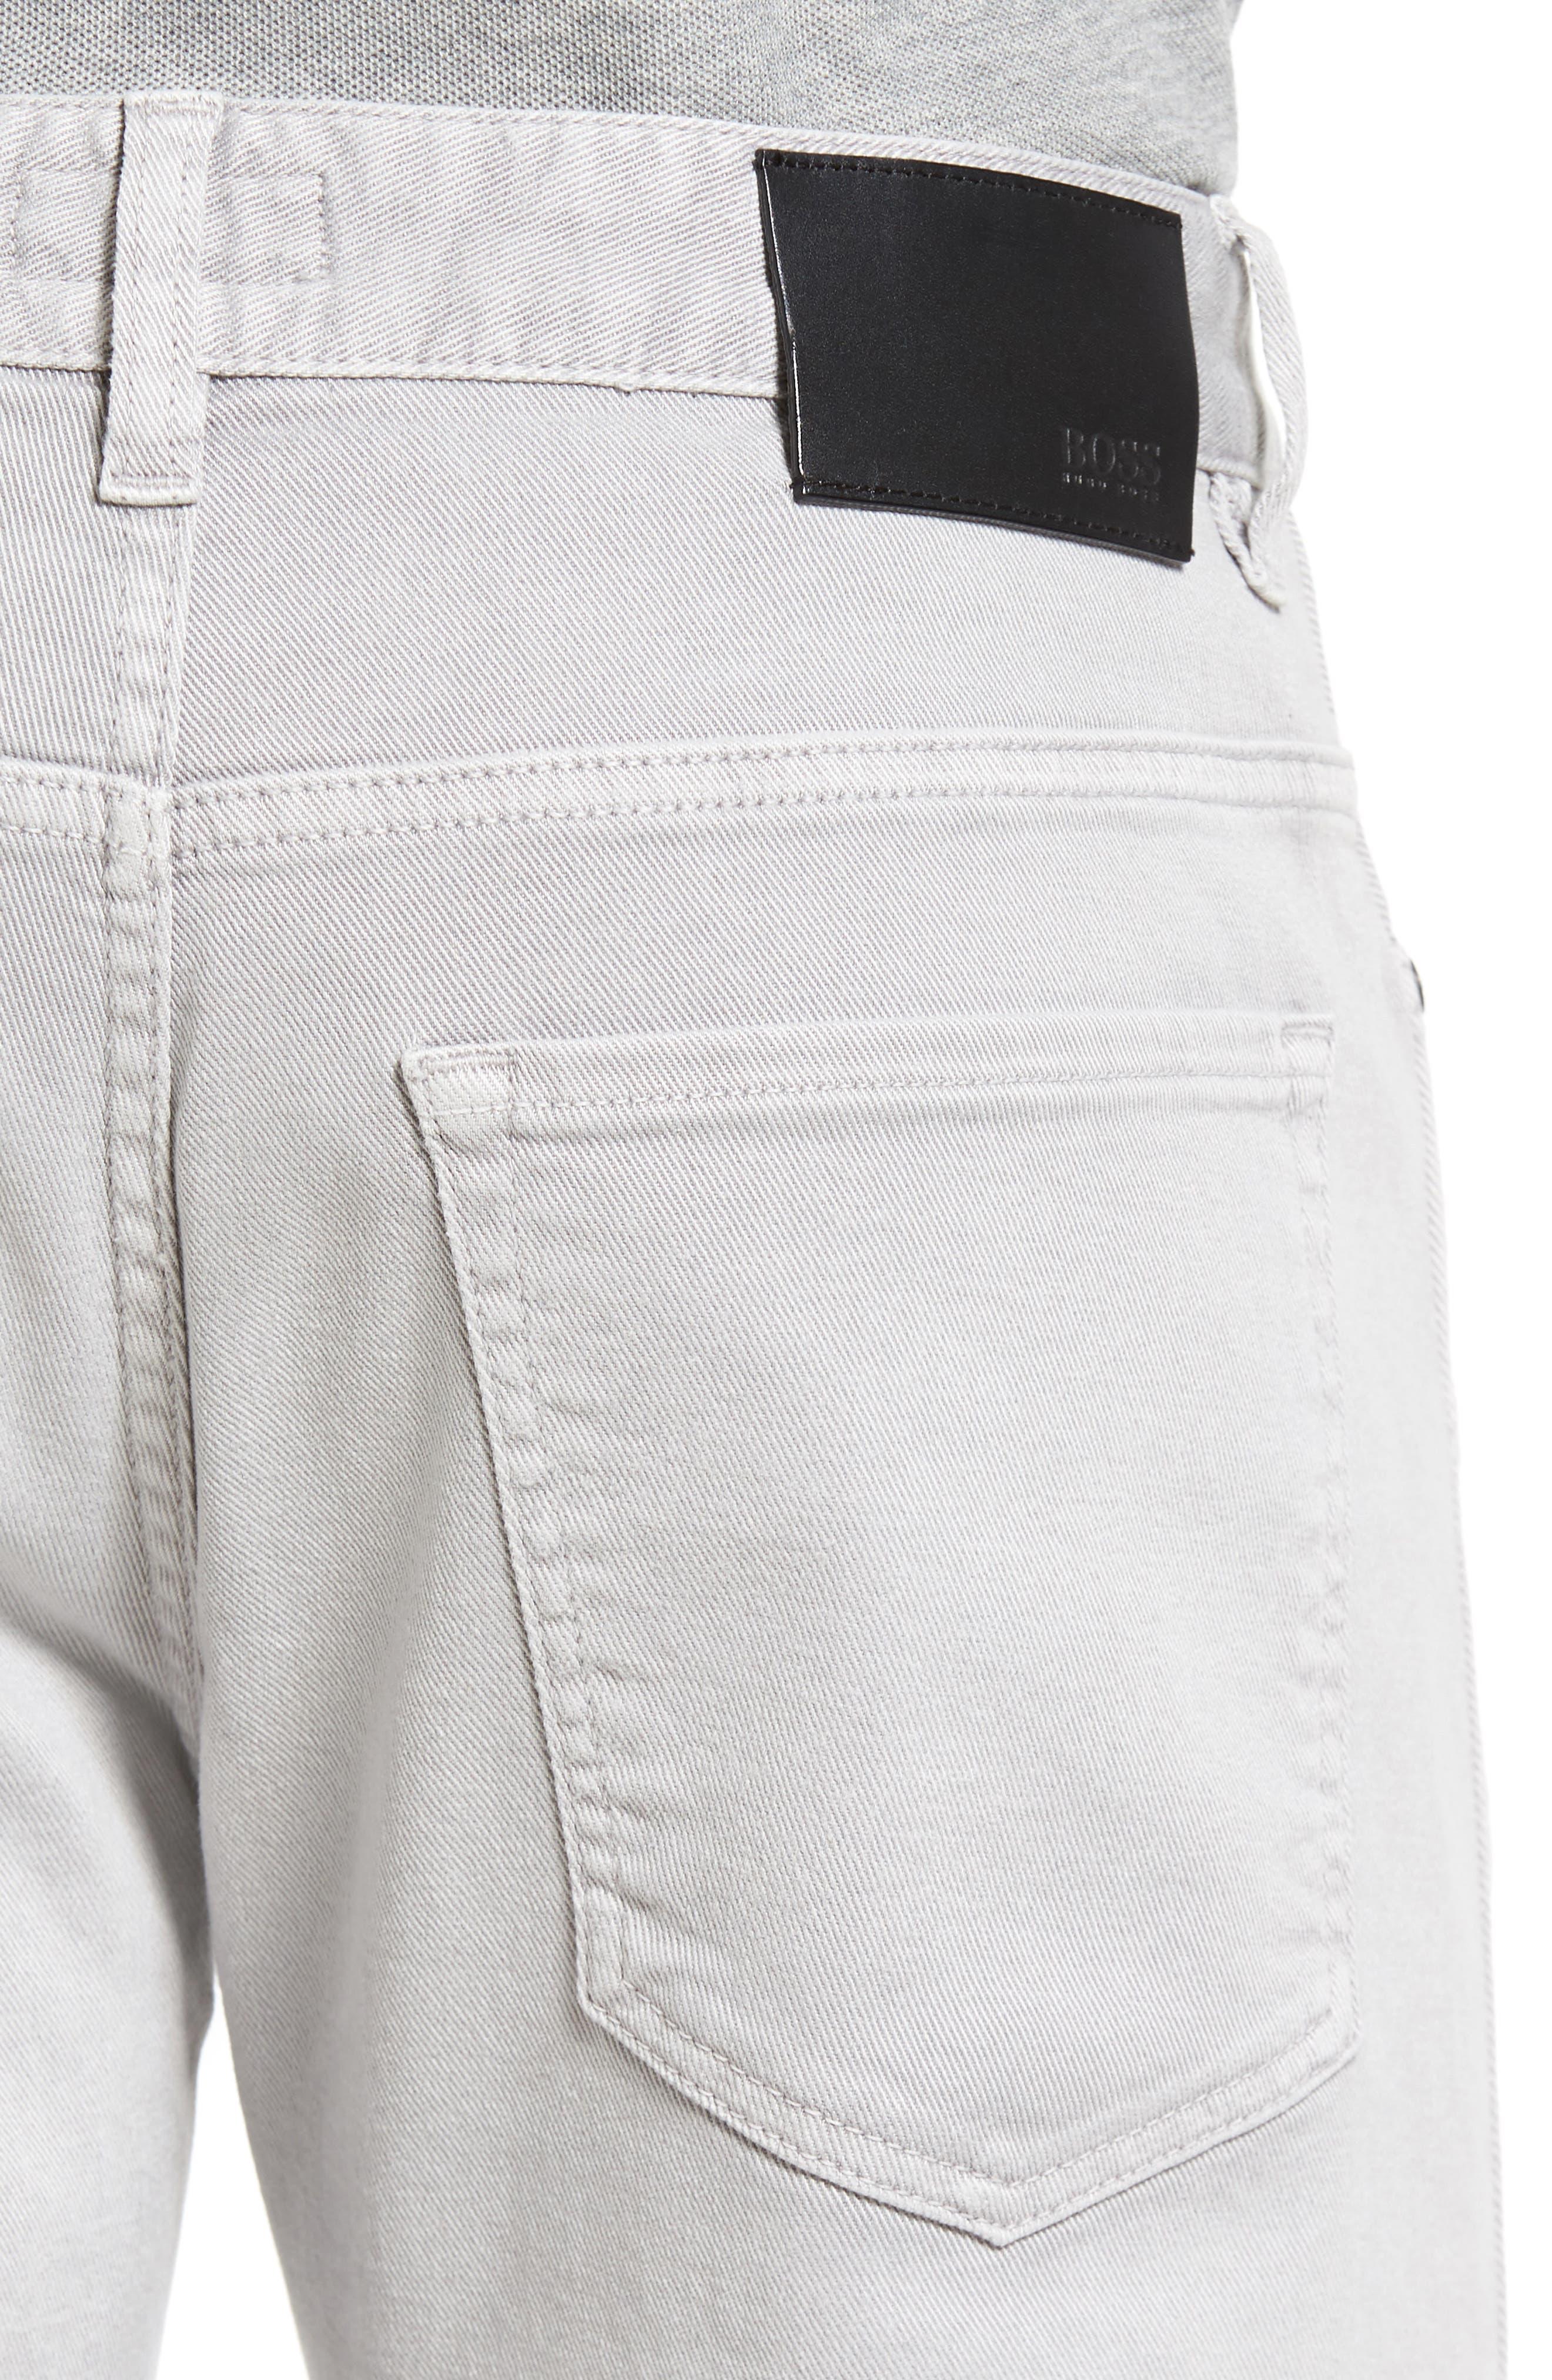 Delaware Grey Slim Fit Jeans,                             Alternate thumbnail 4, color,                             072